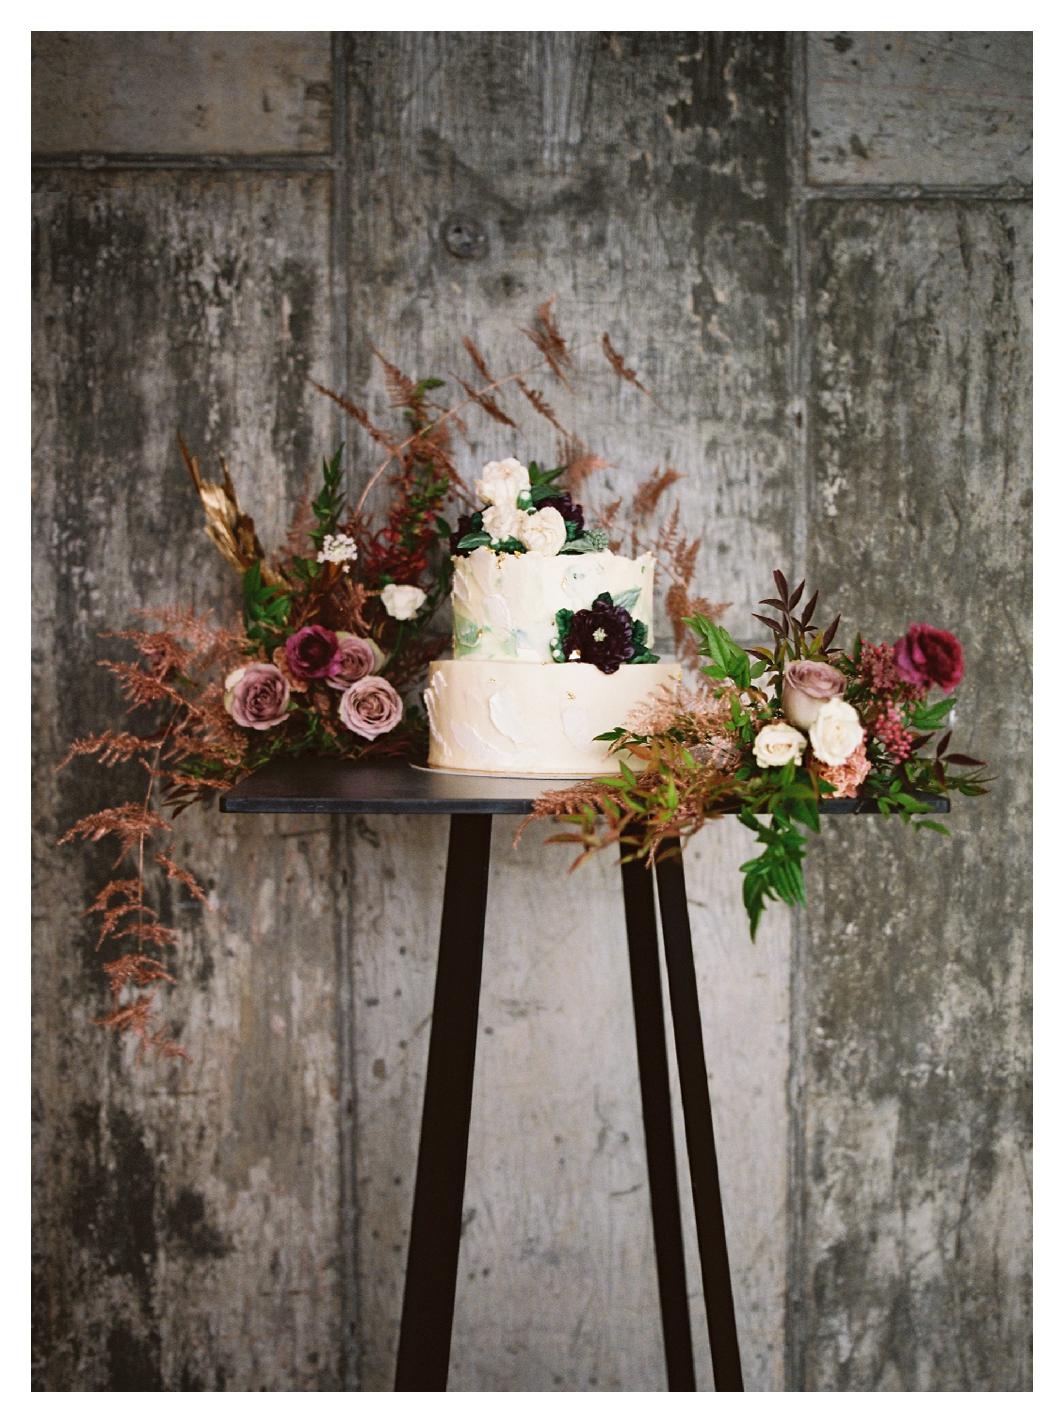 wedding cake, buttercream flowers cake, wedding cake decor